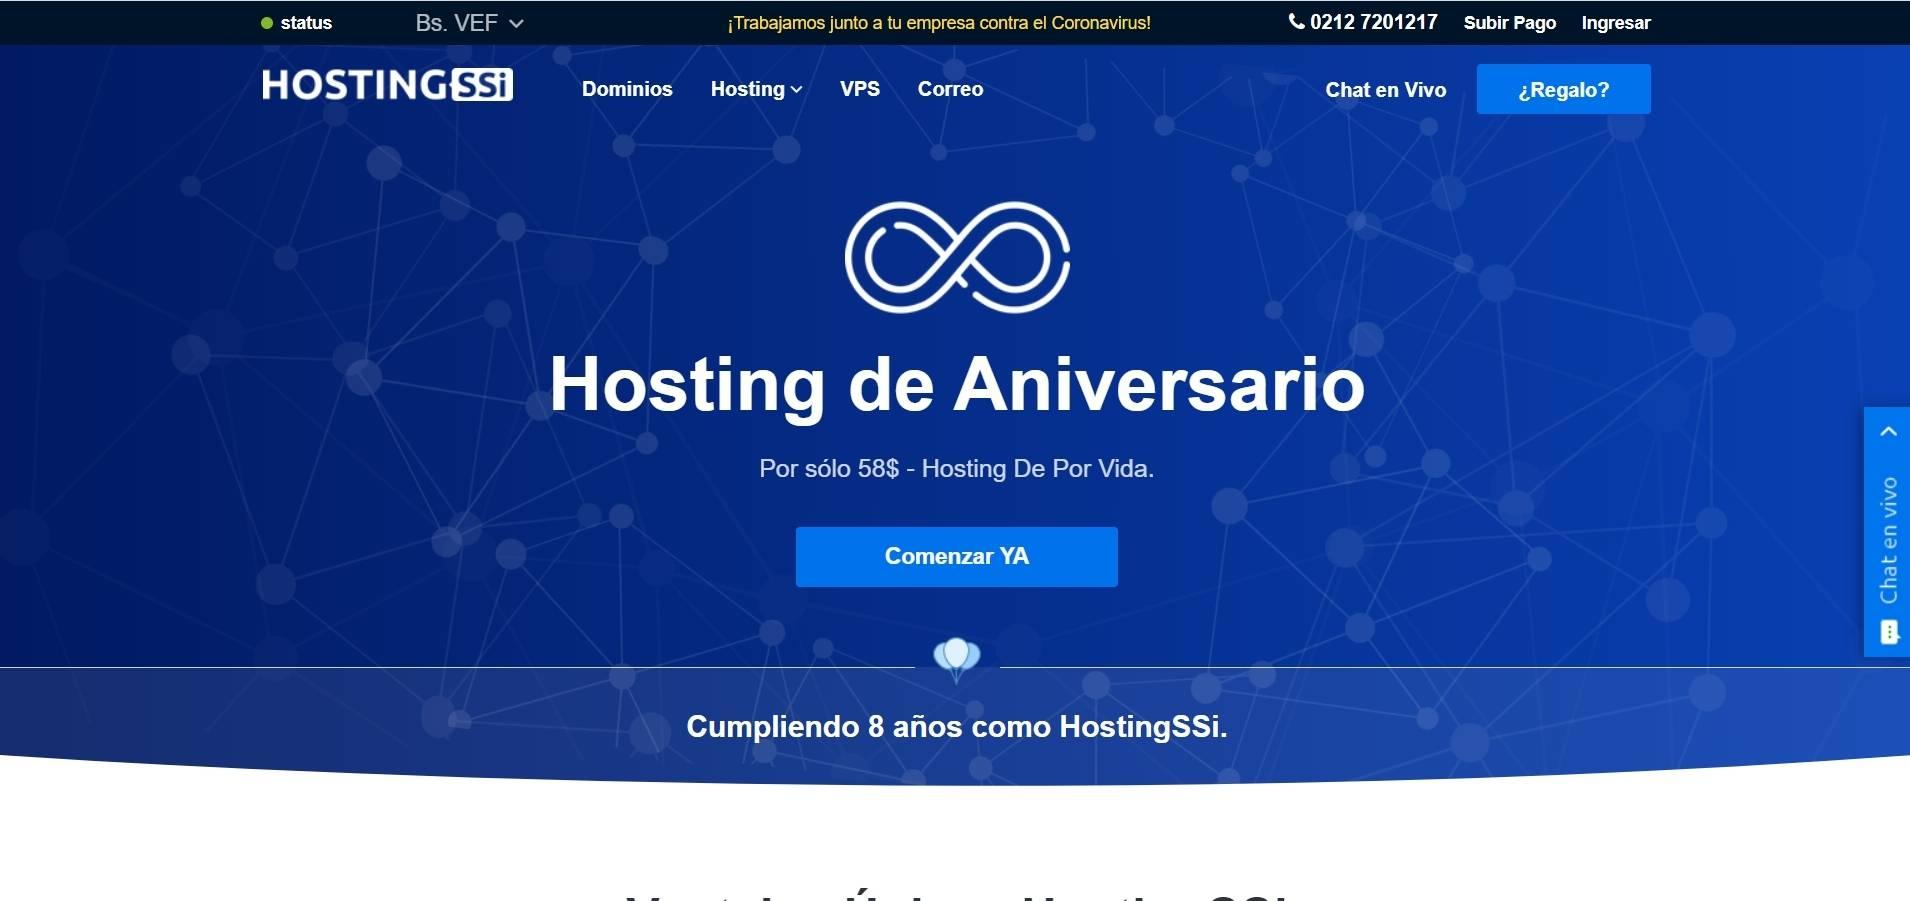 HostingSSI